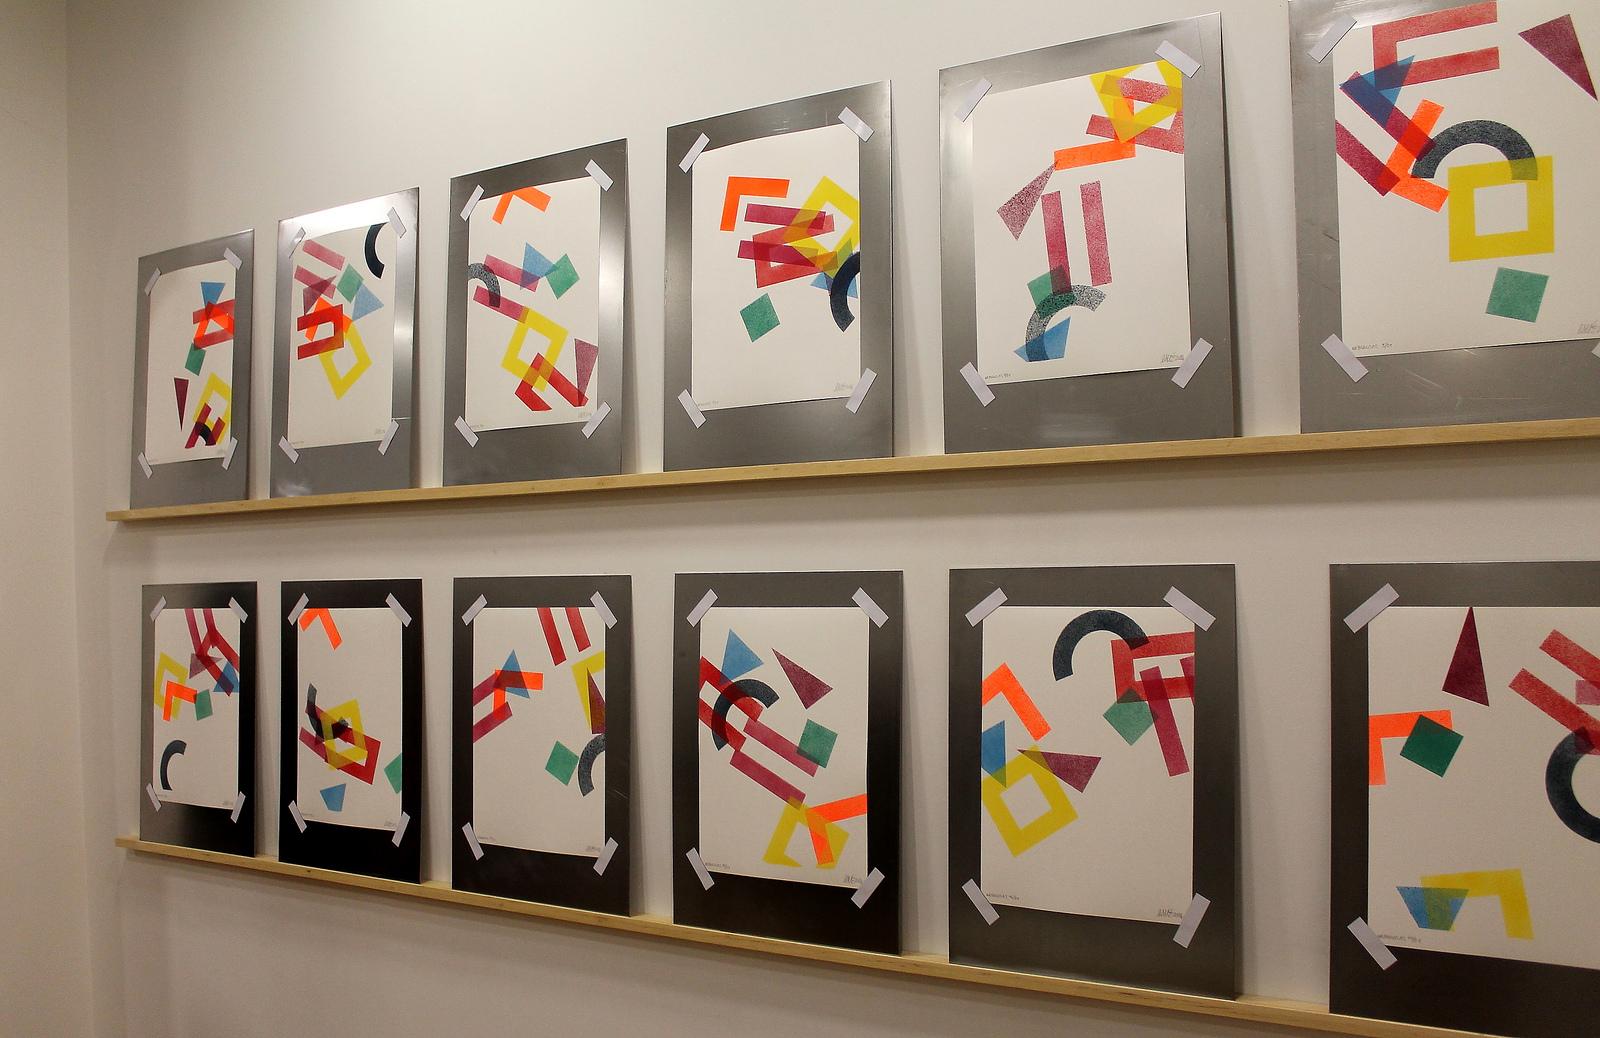 eltono-amalgama-at-galeria-slowtrack-canizares-recap-08